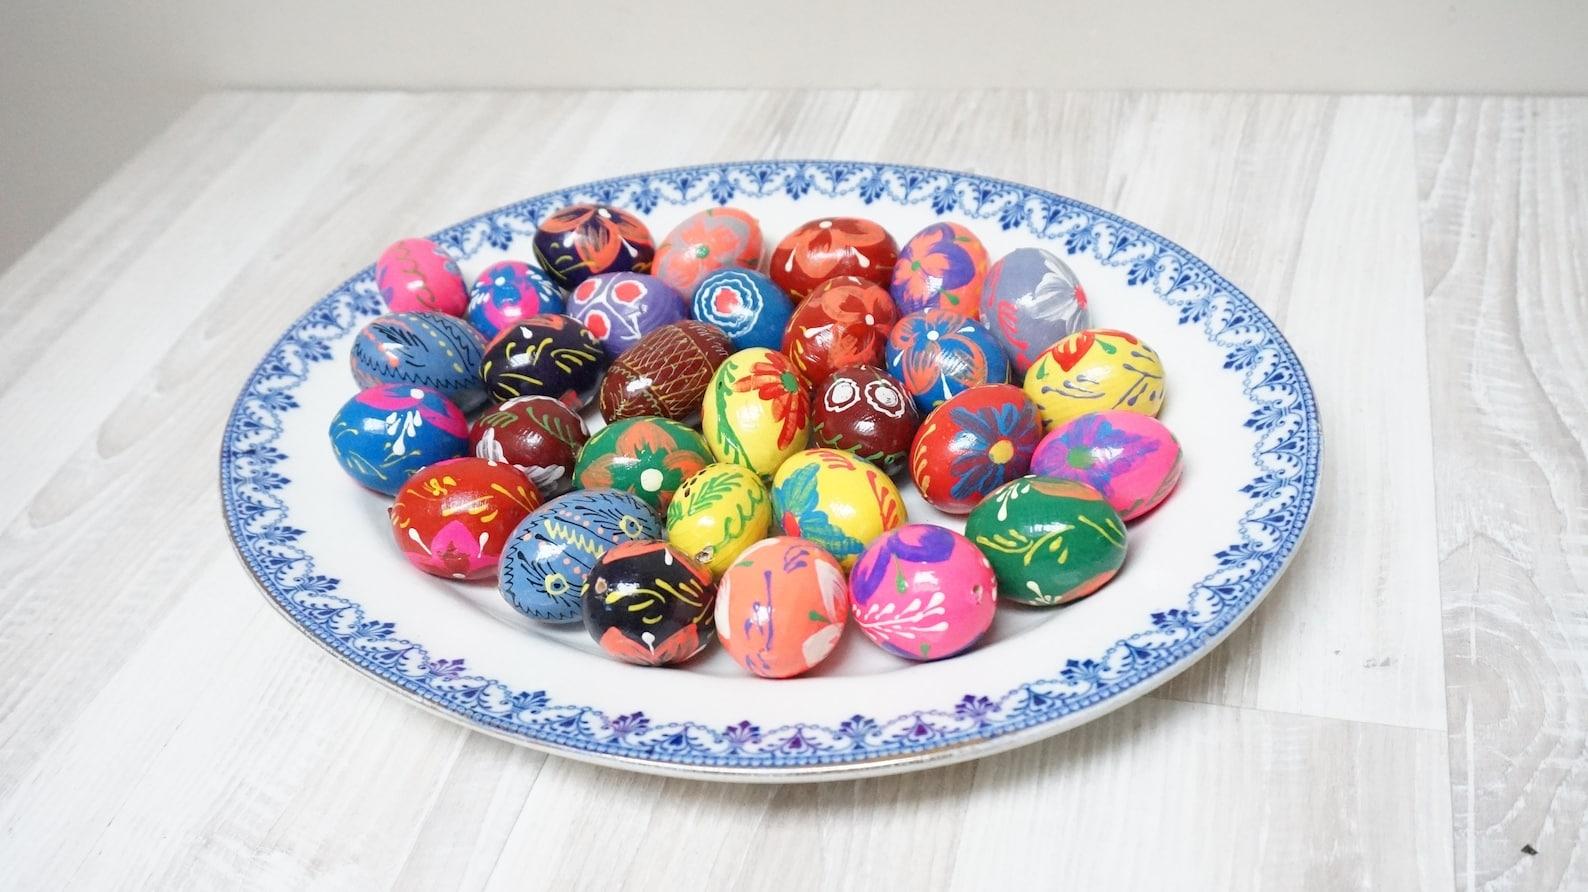 10 small random German Erzgebirge hanging Easter figurines eggs egg spring Vintage ornaments wooden Retro made in Germany set lot DDR blue